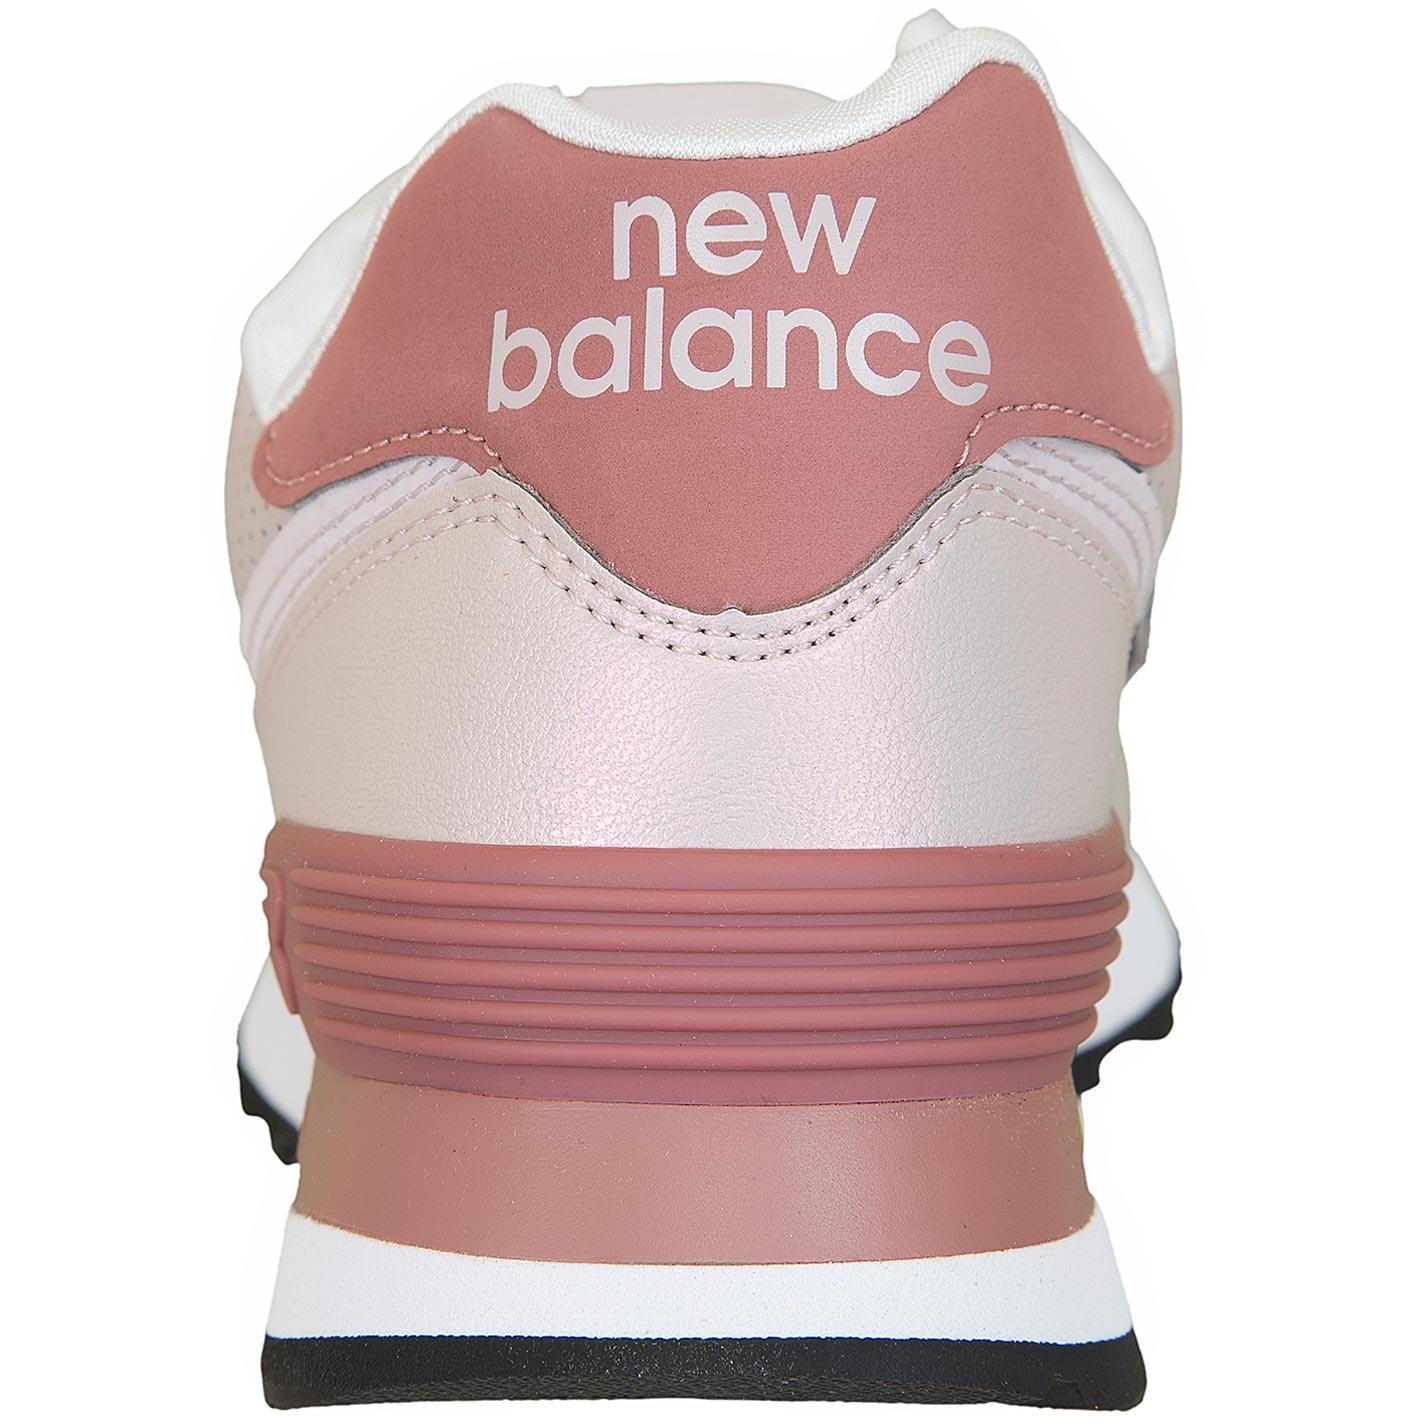 ☆ New Balance Damen Sneaker 574 Synthetik/Leder rosa - hier ...